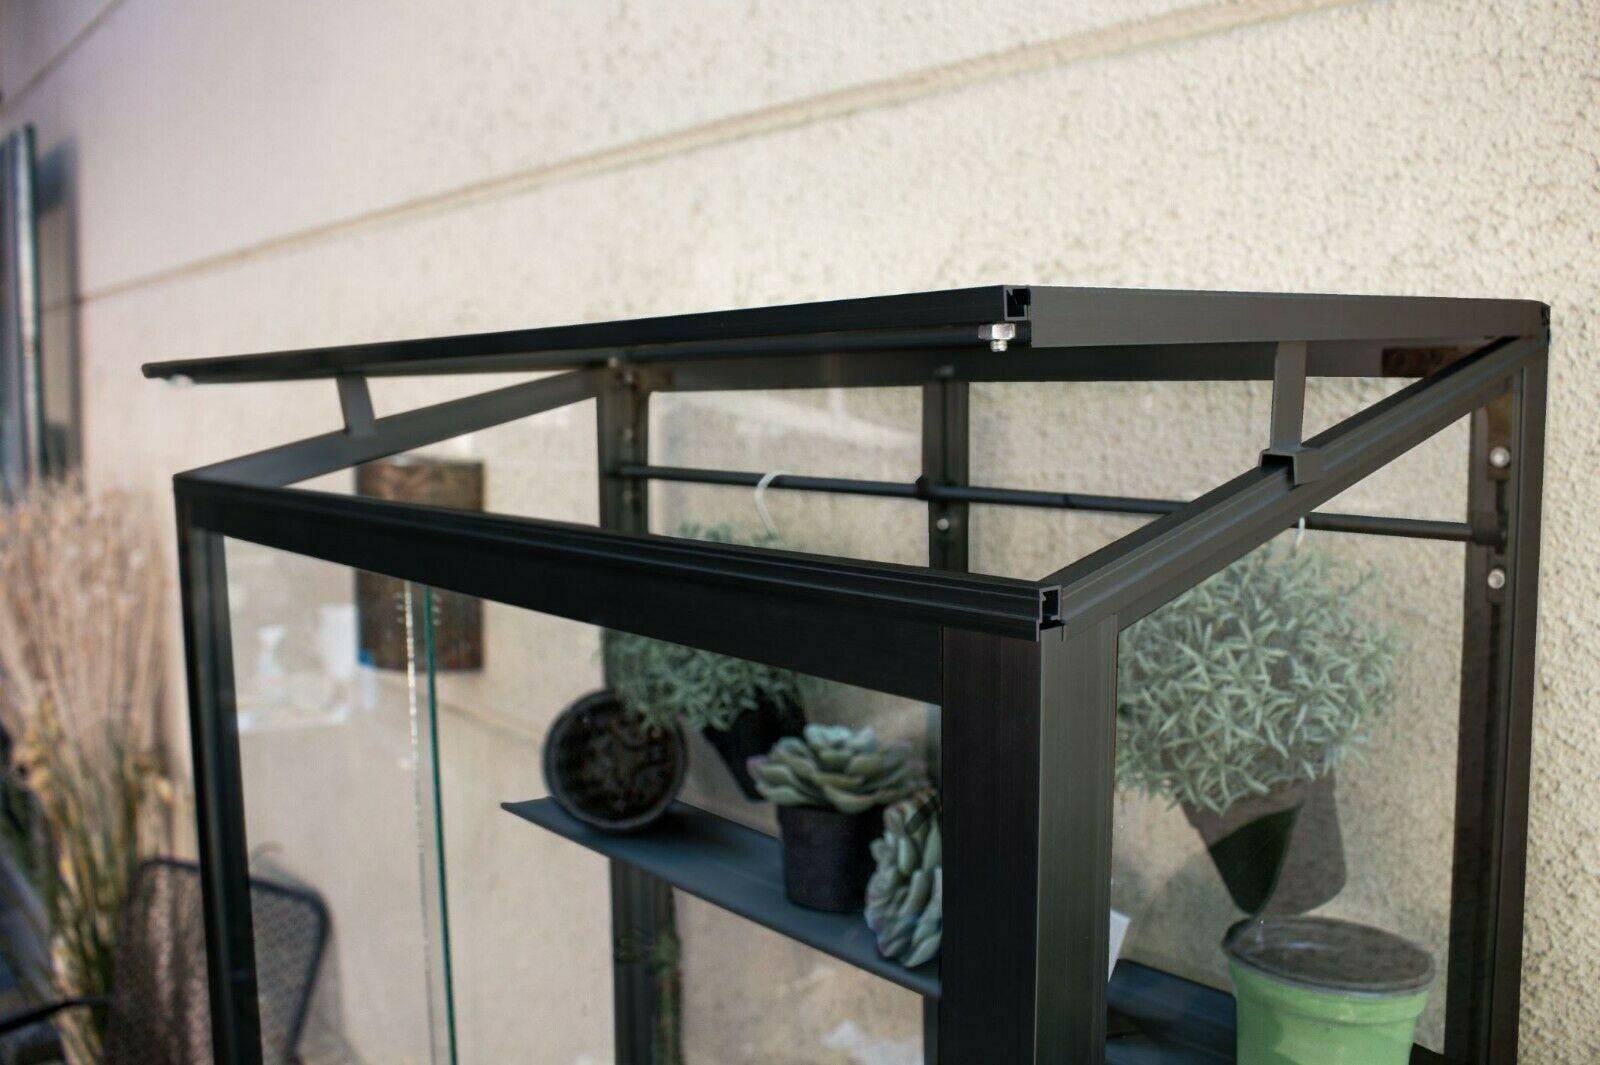 Vitavia Polis Balkongewächshaus 350 ESG schwarz - Balkon Gewächshaus